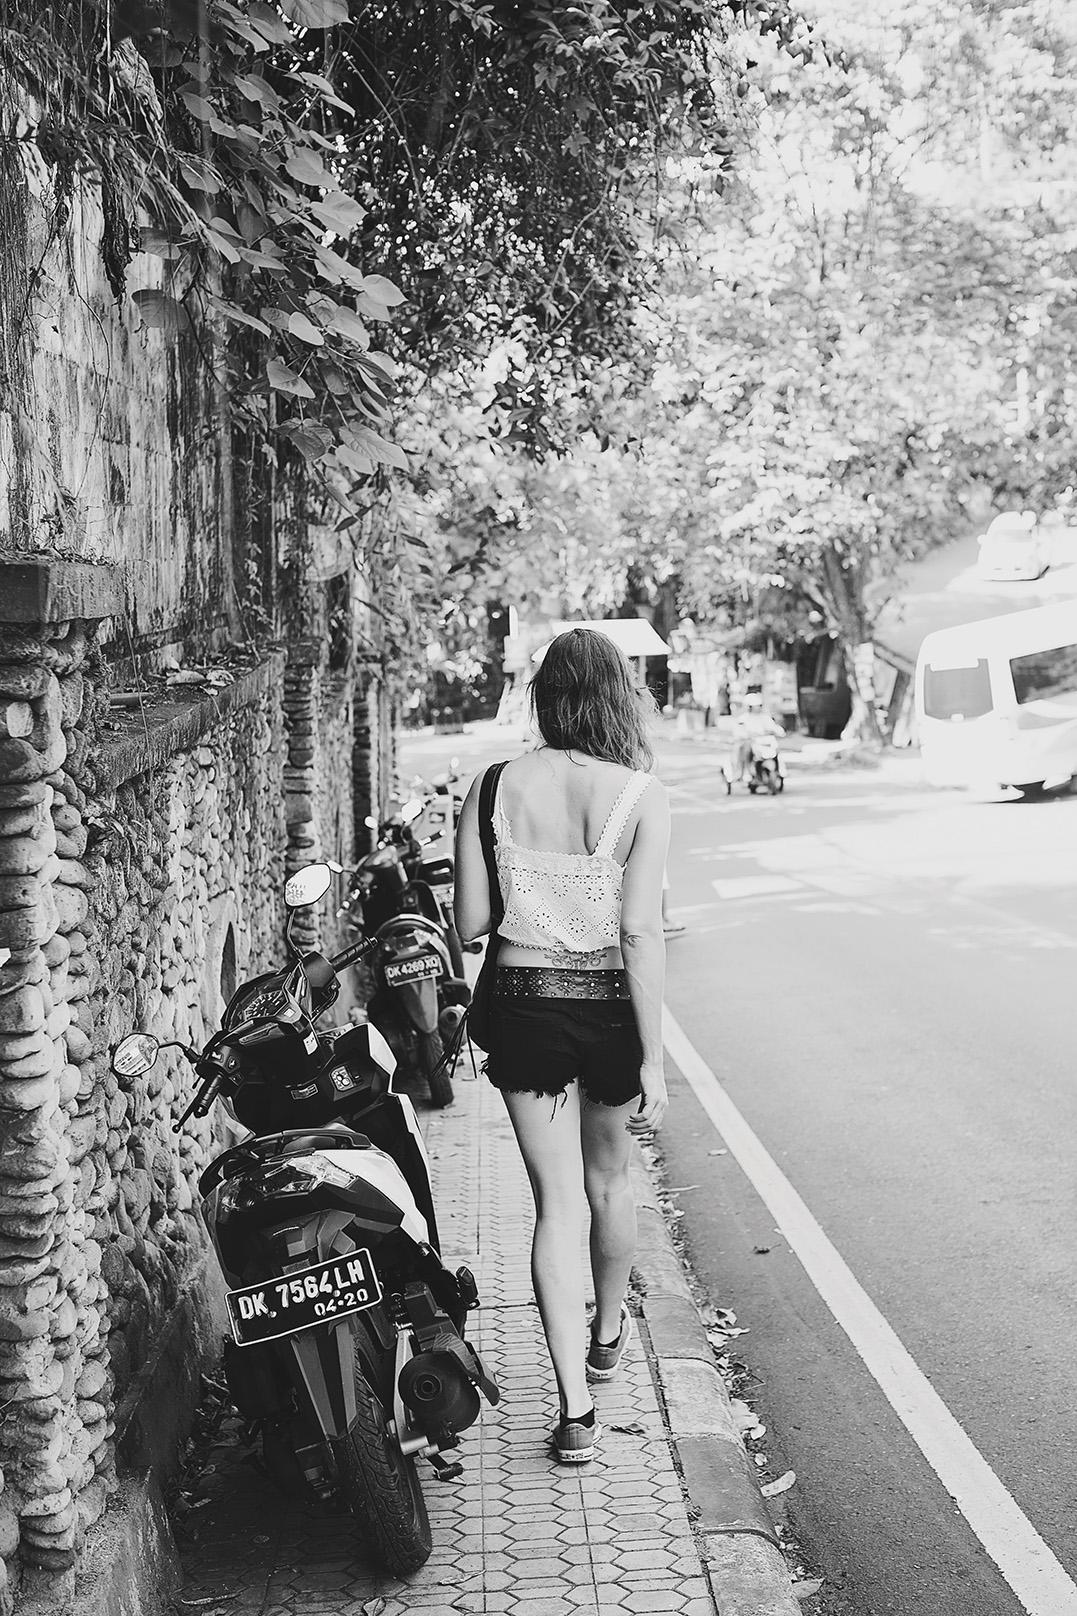 03 Unique Bali Adventure Photography.jpg